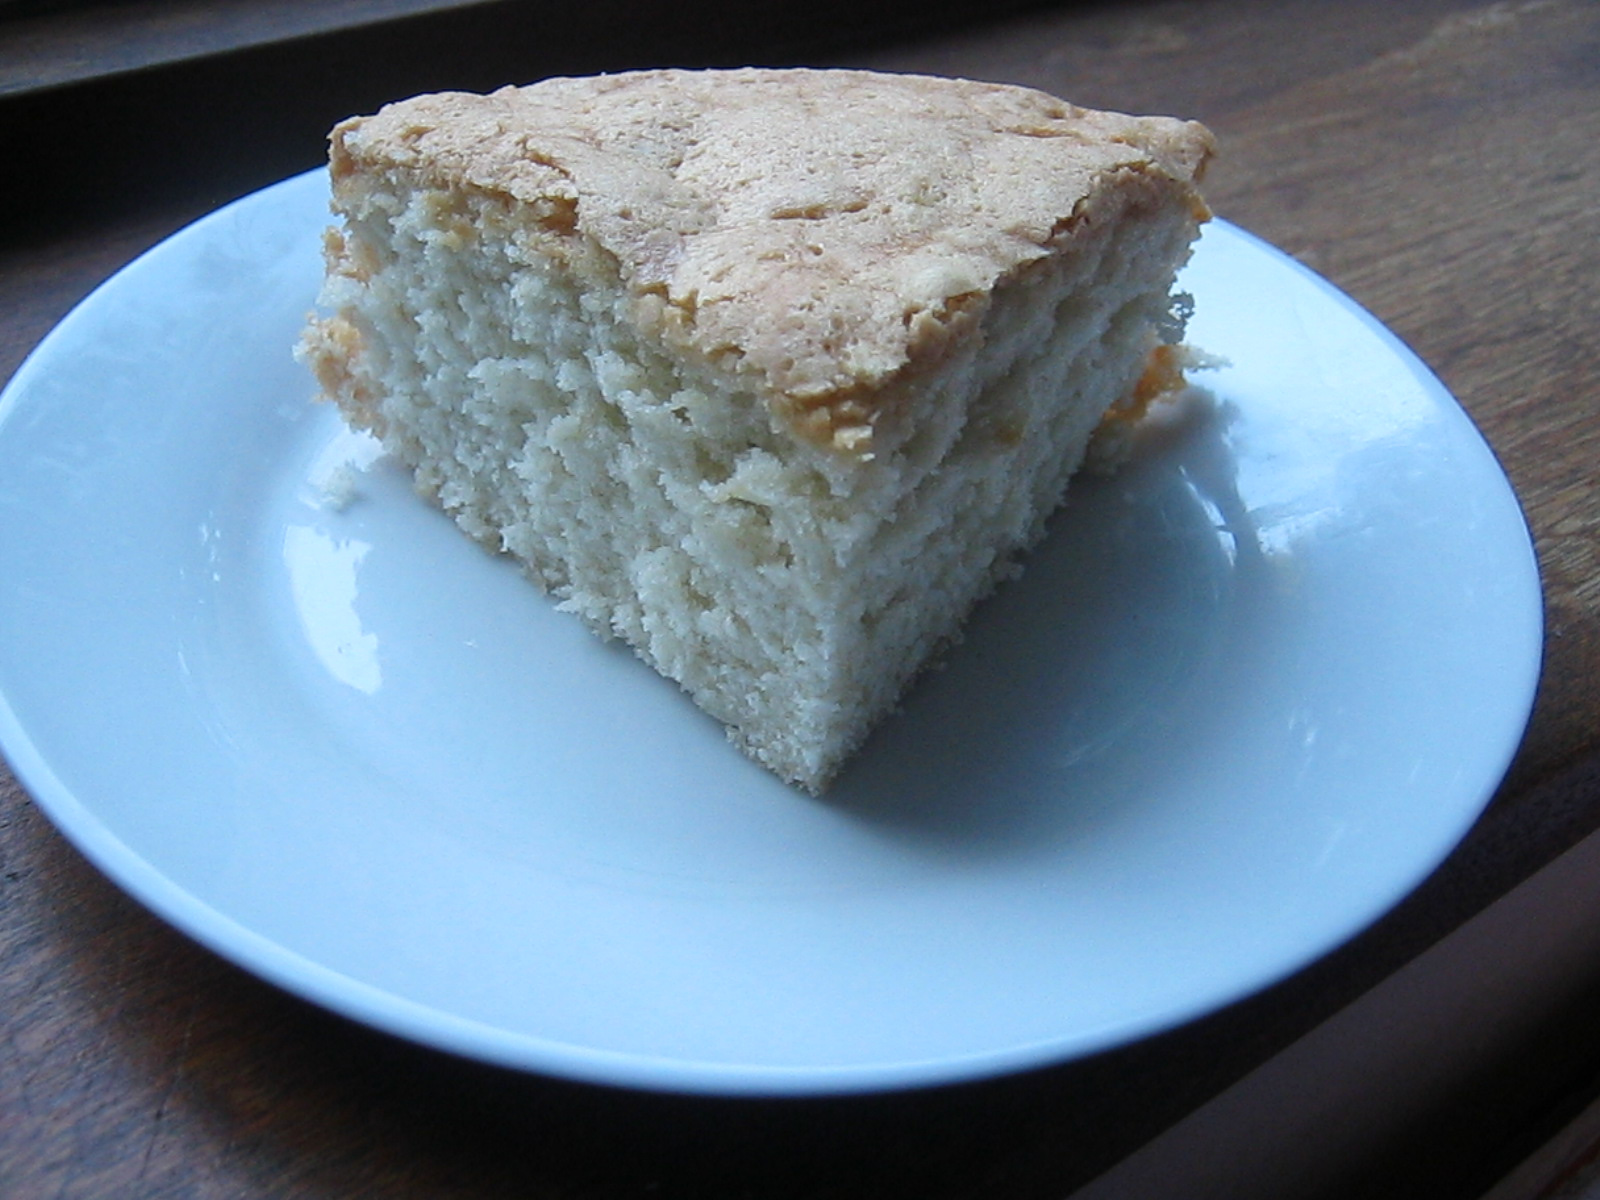 Buddy Valastro Sponge Cake Recipe